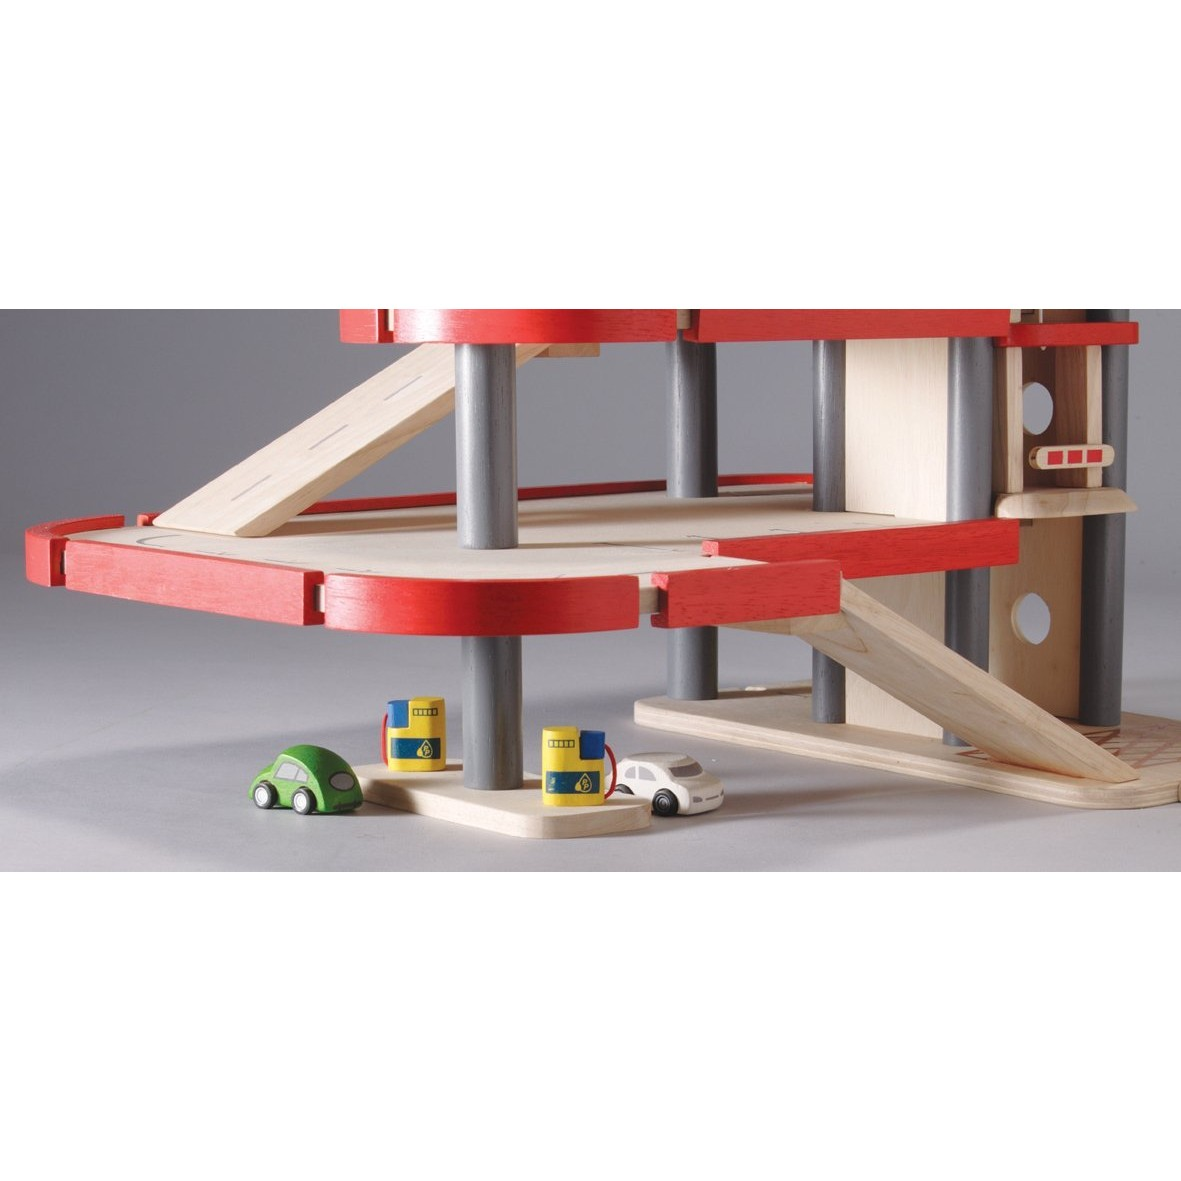 Home / TOY SHOP / road, rail & garage / Plan Toys Parking Garage ...